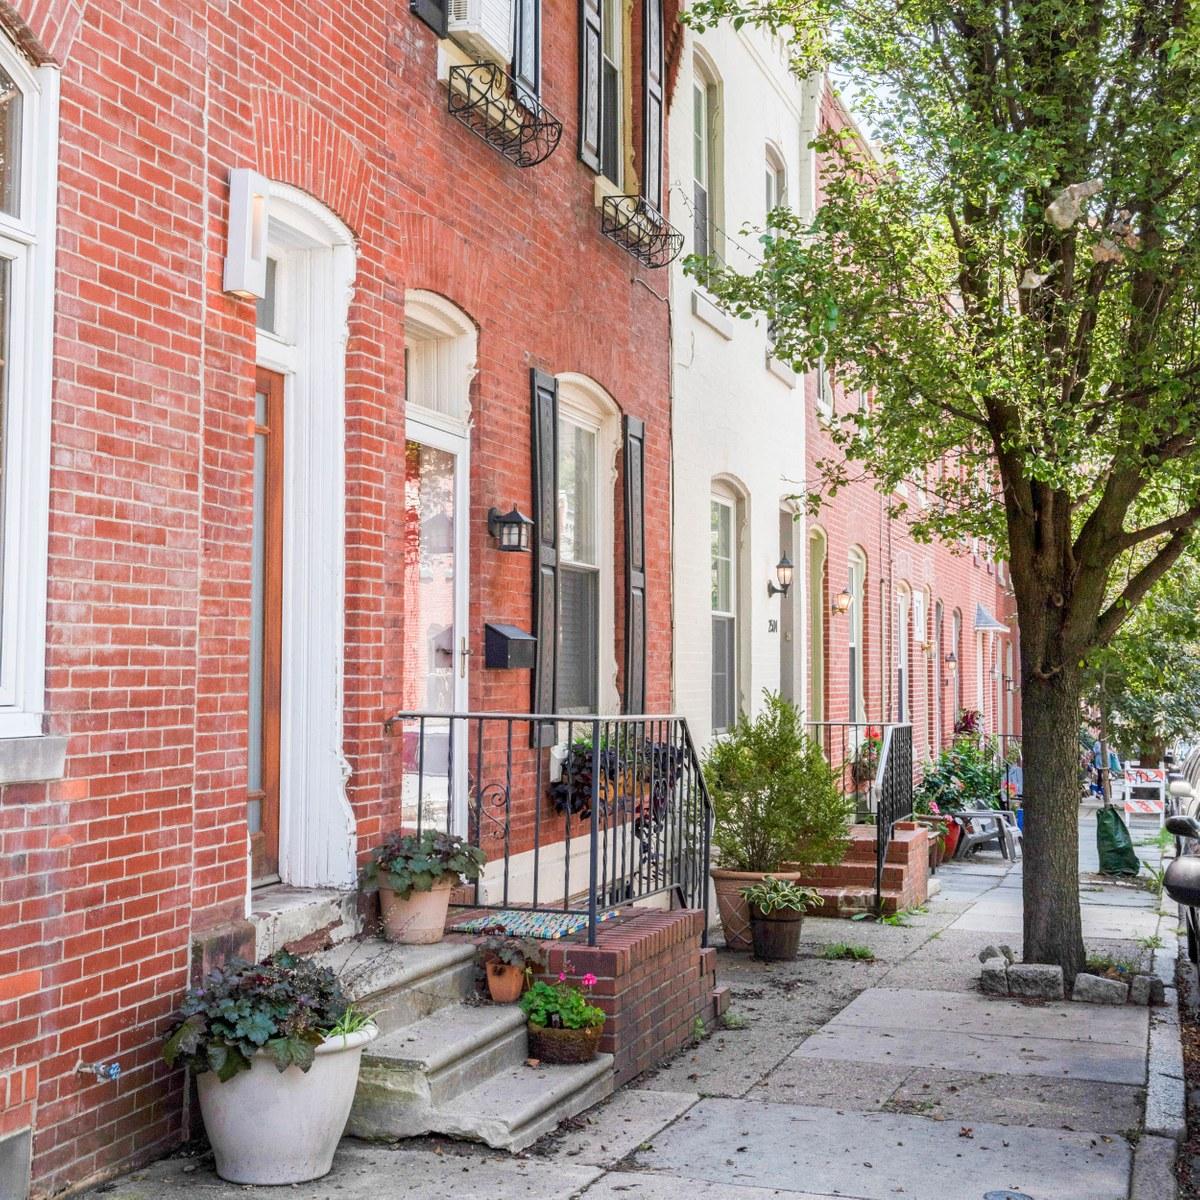 Fairmount, Philadelphia PA - Neighborhood Guide